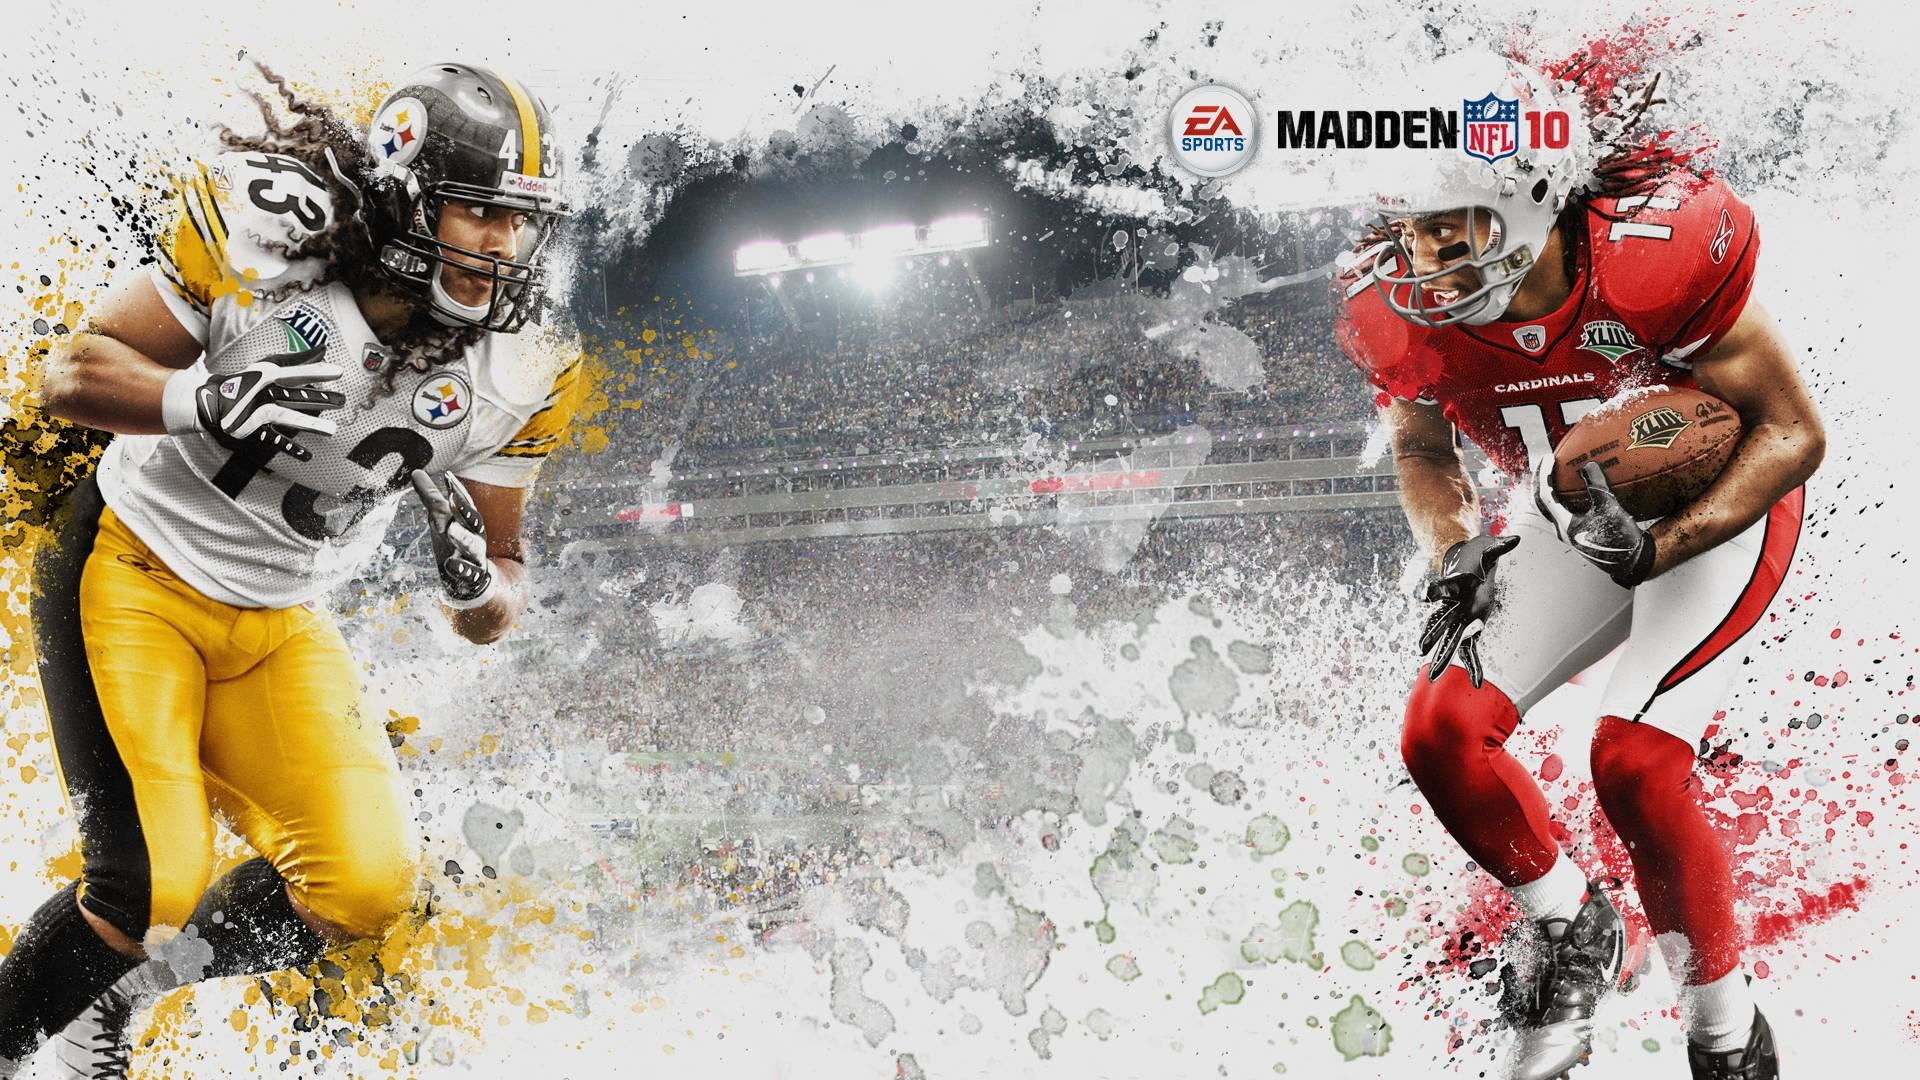 American football wallpaper hd